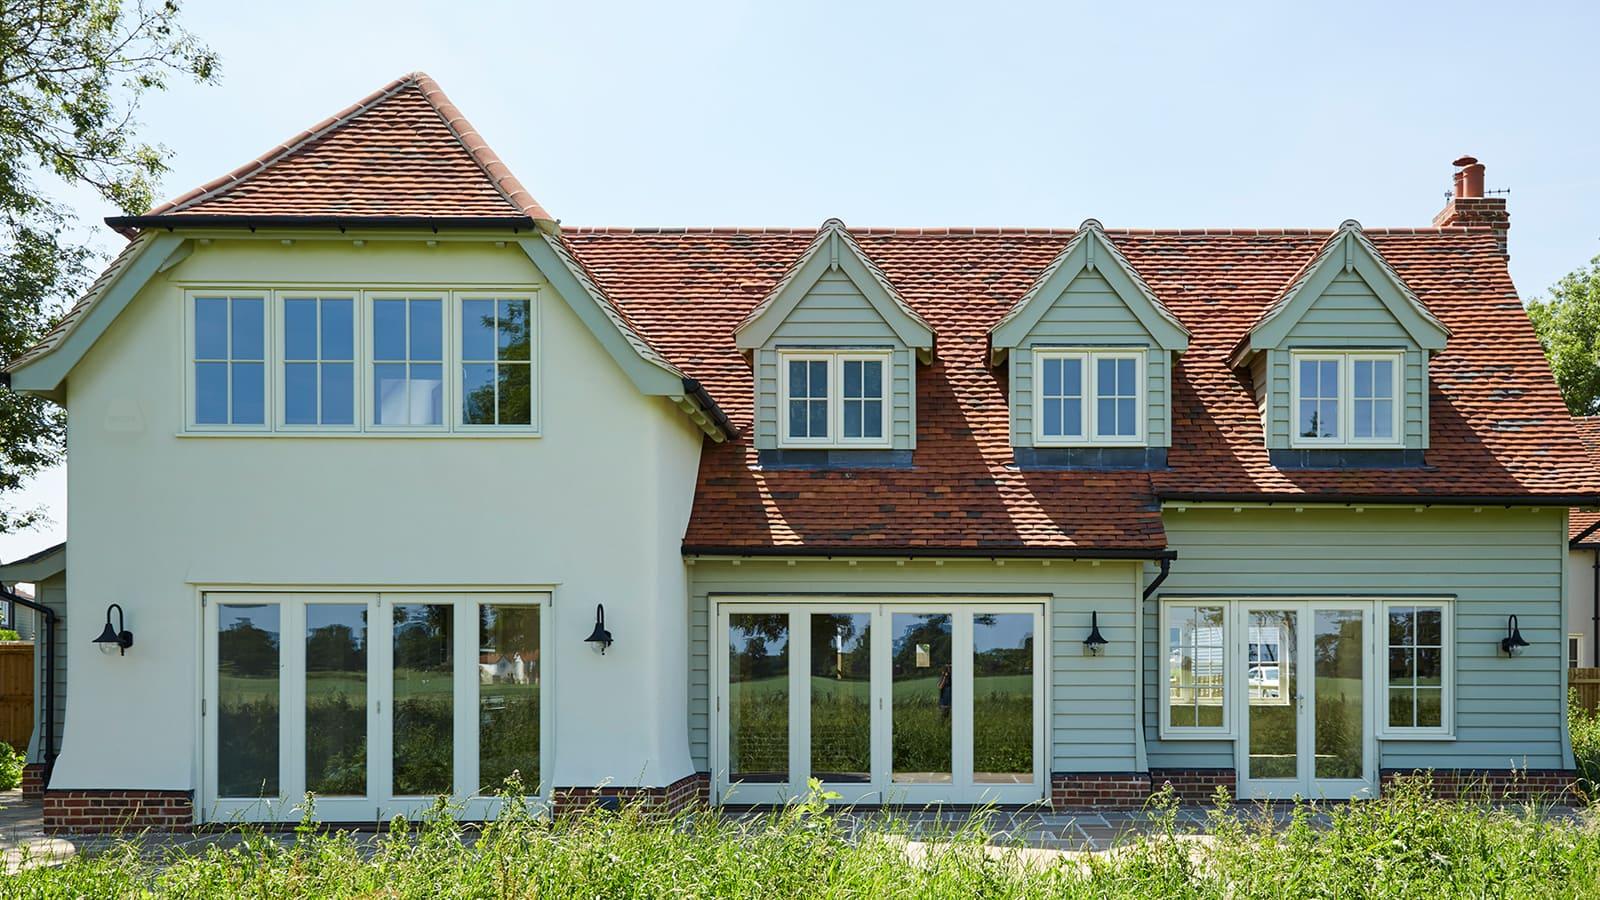 New build fully glazed casement windows and glazed sliding doors